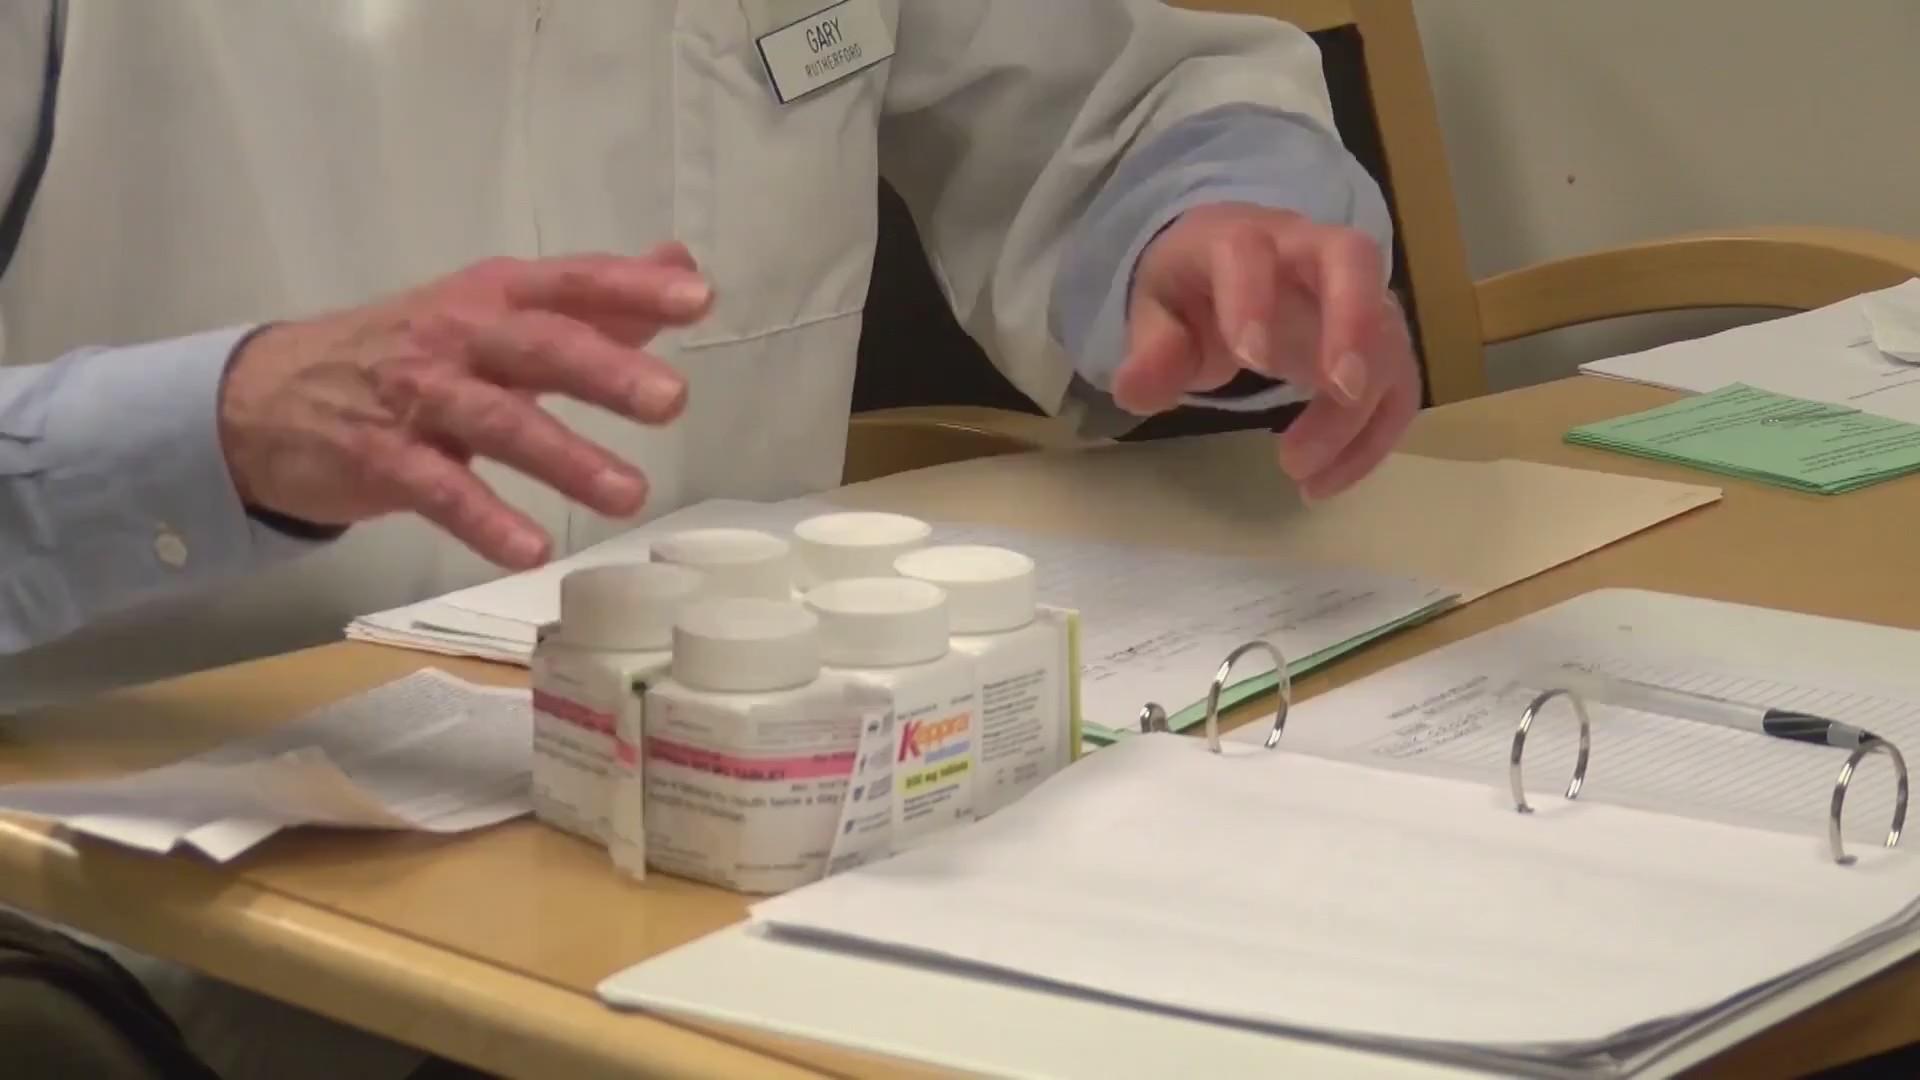 Maryland_Drug_Grant_1_20181026211016